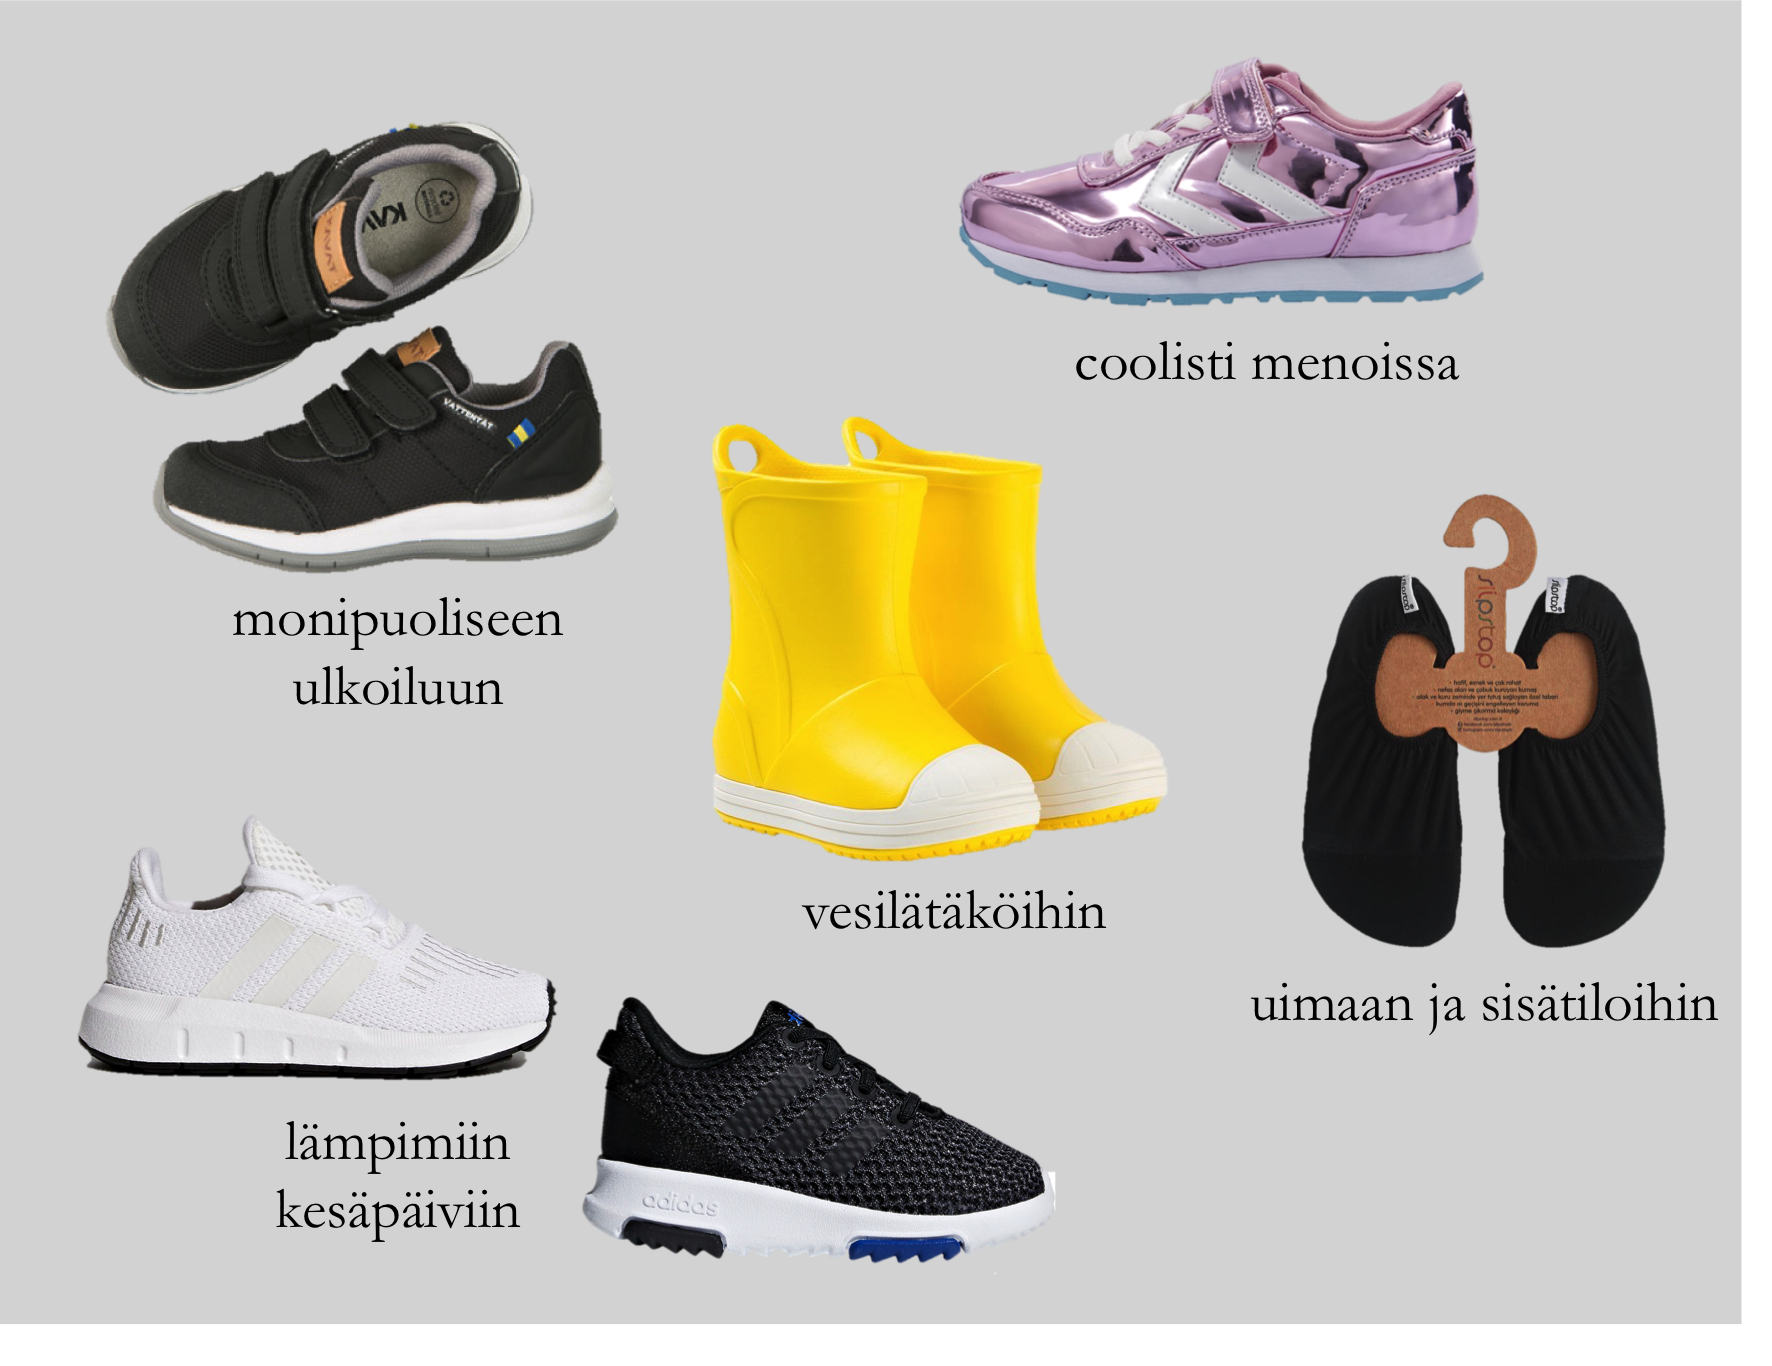 Kevään kenkävalinnat taaperolle